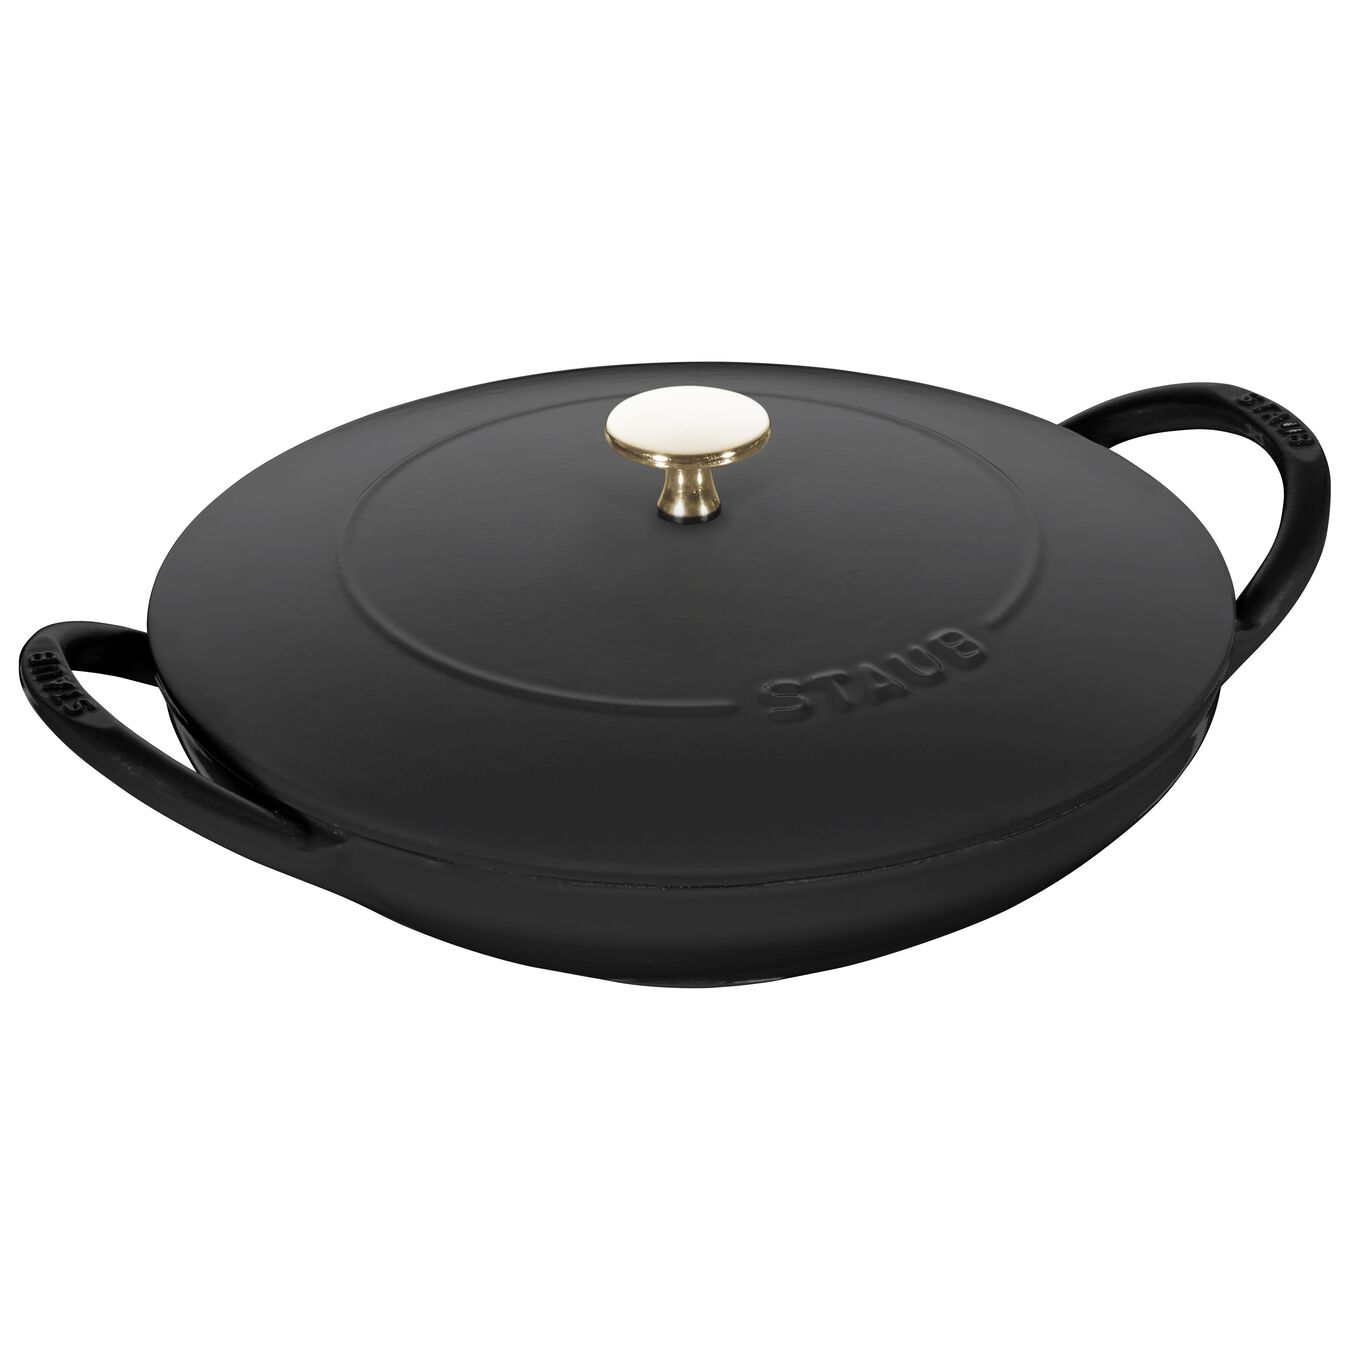 24 cm / 9.5 inch Wok, black,,large 1